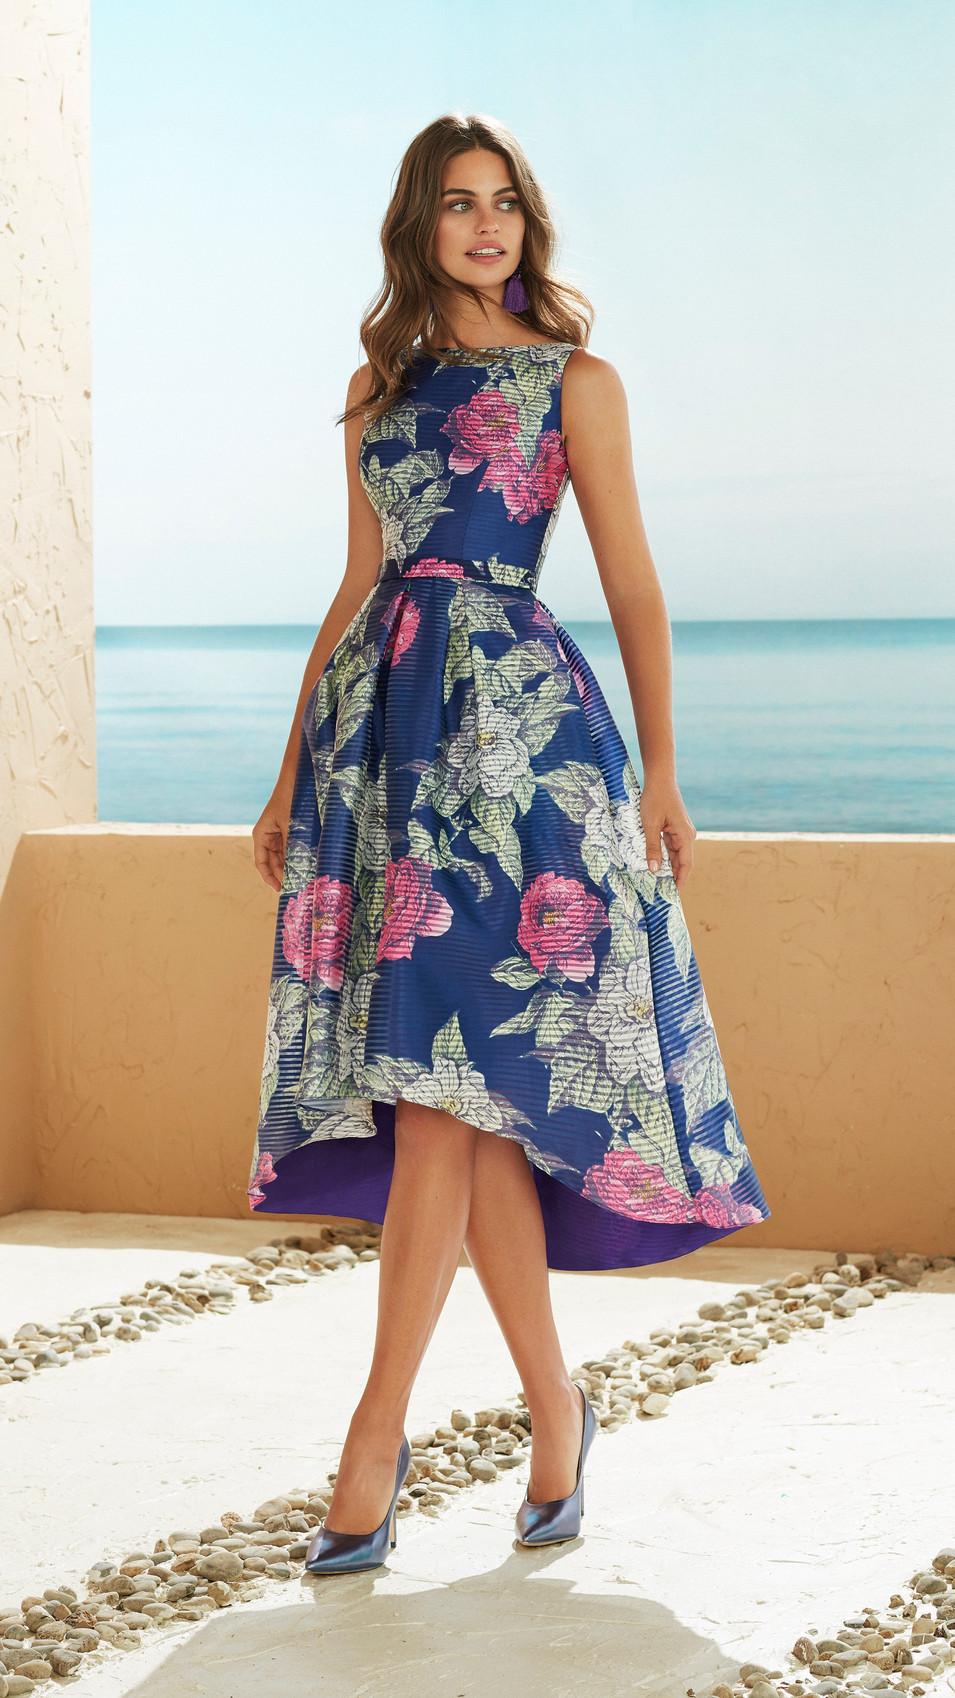 Dip Hem Floral Dress